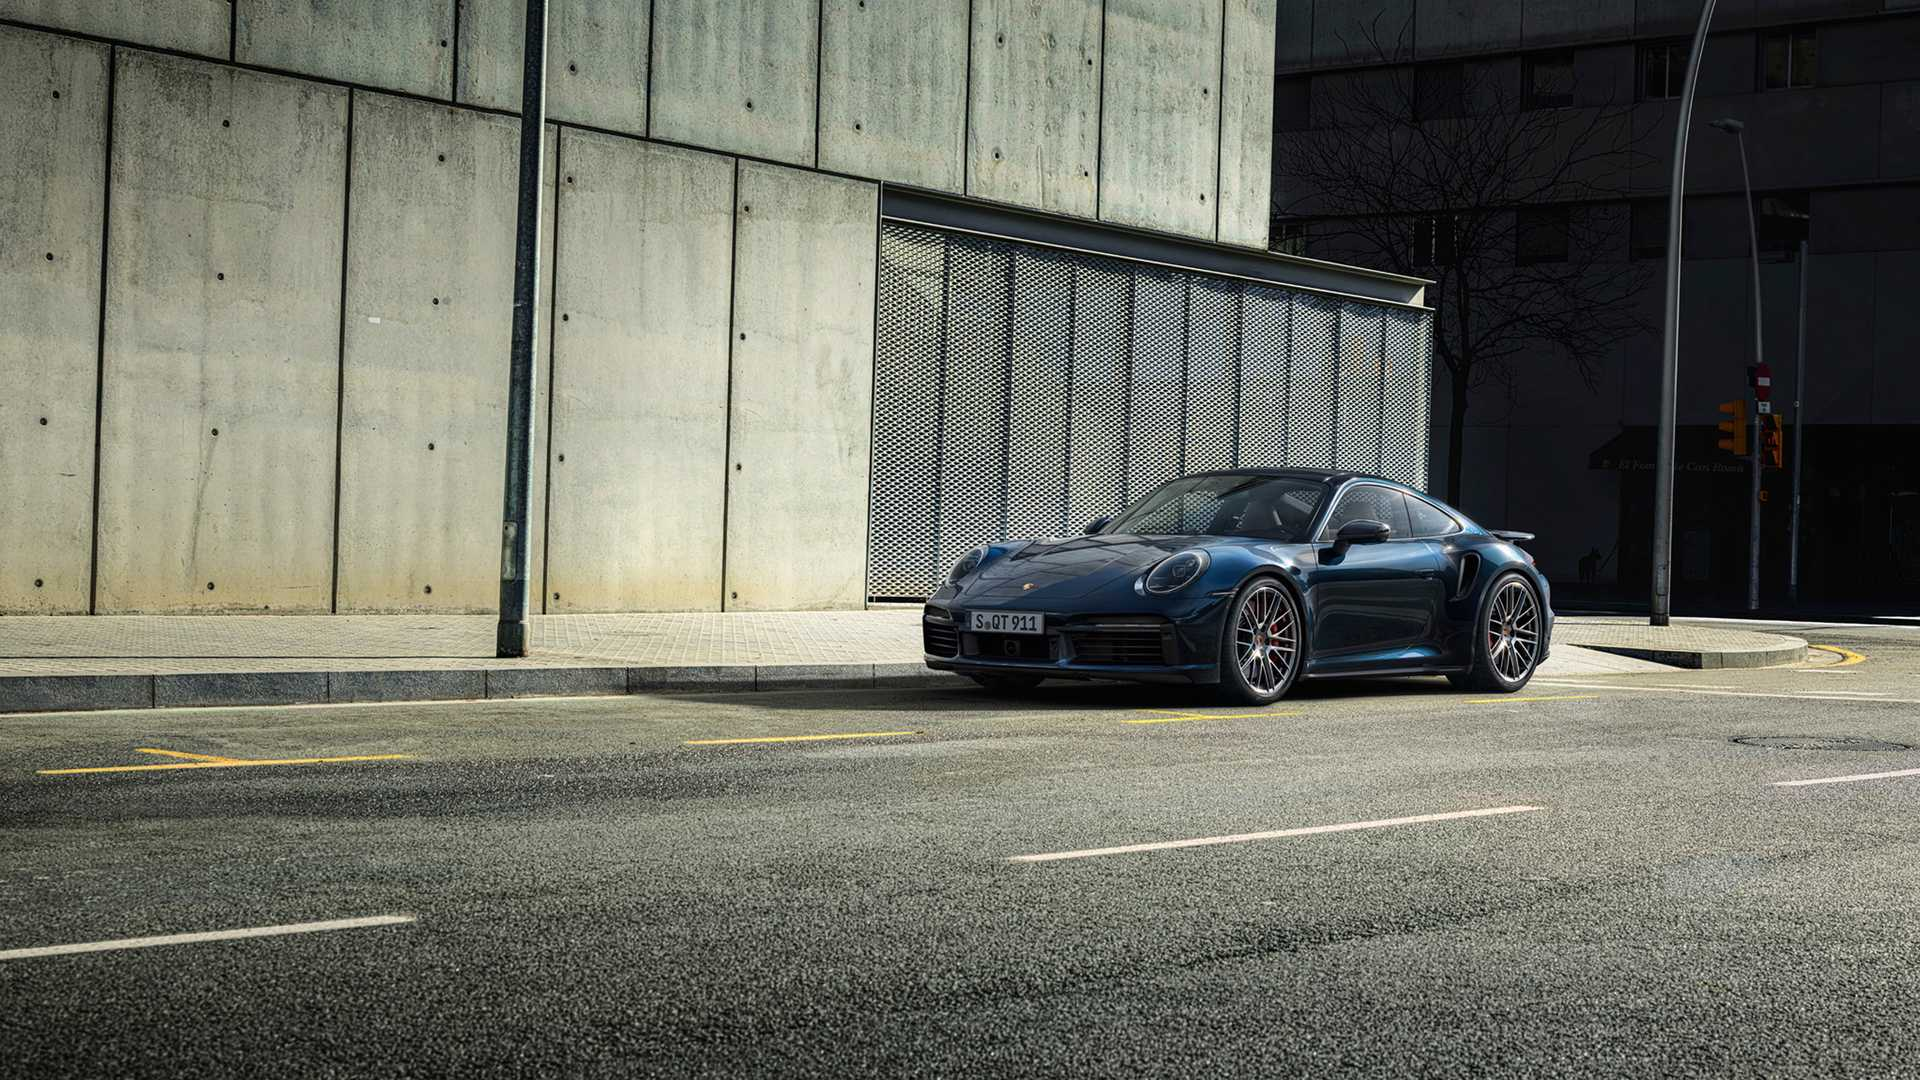 2021-porsche-911-turbo-coupe-3